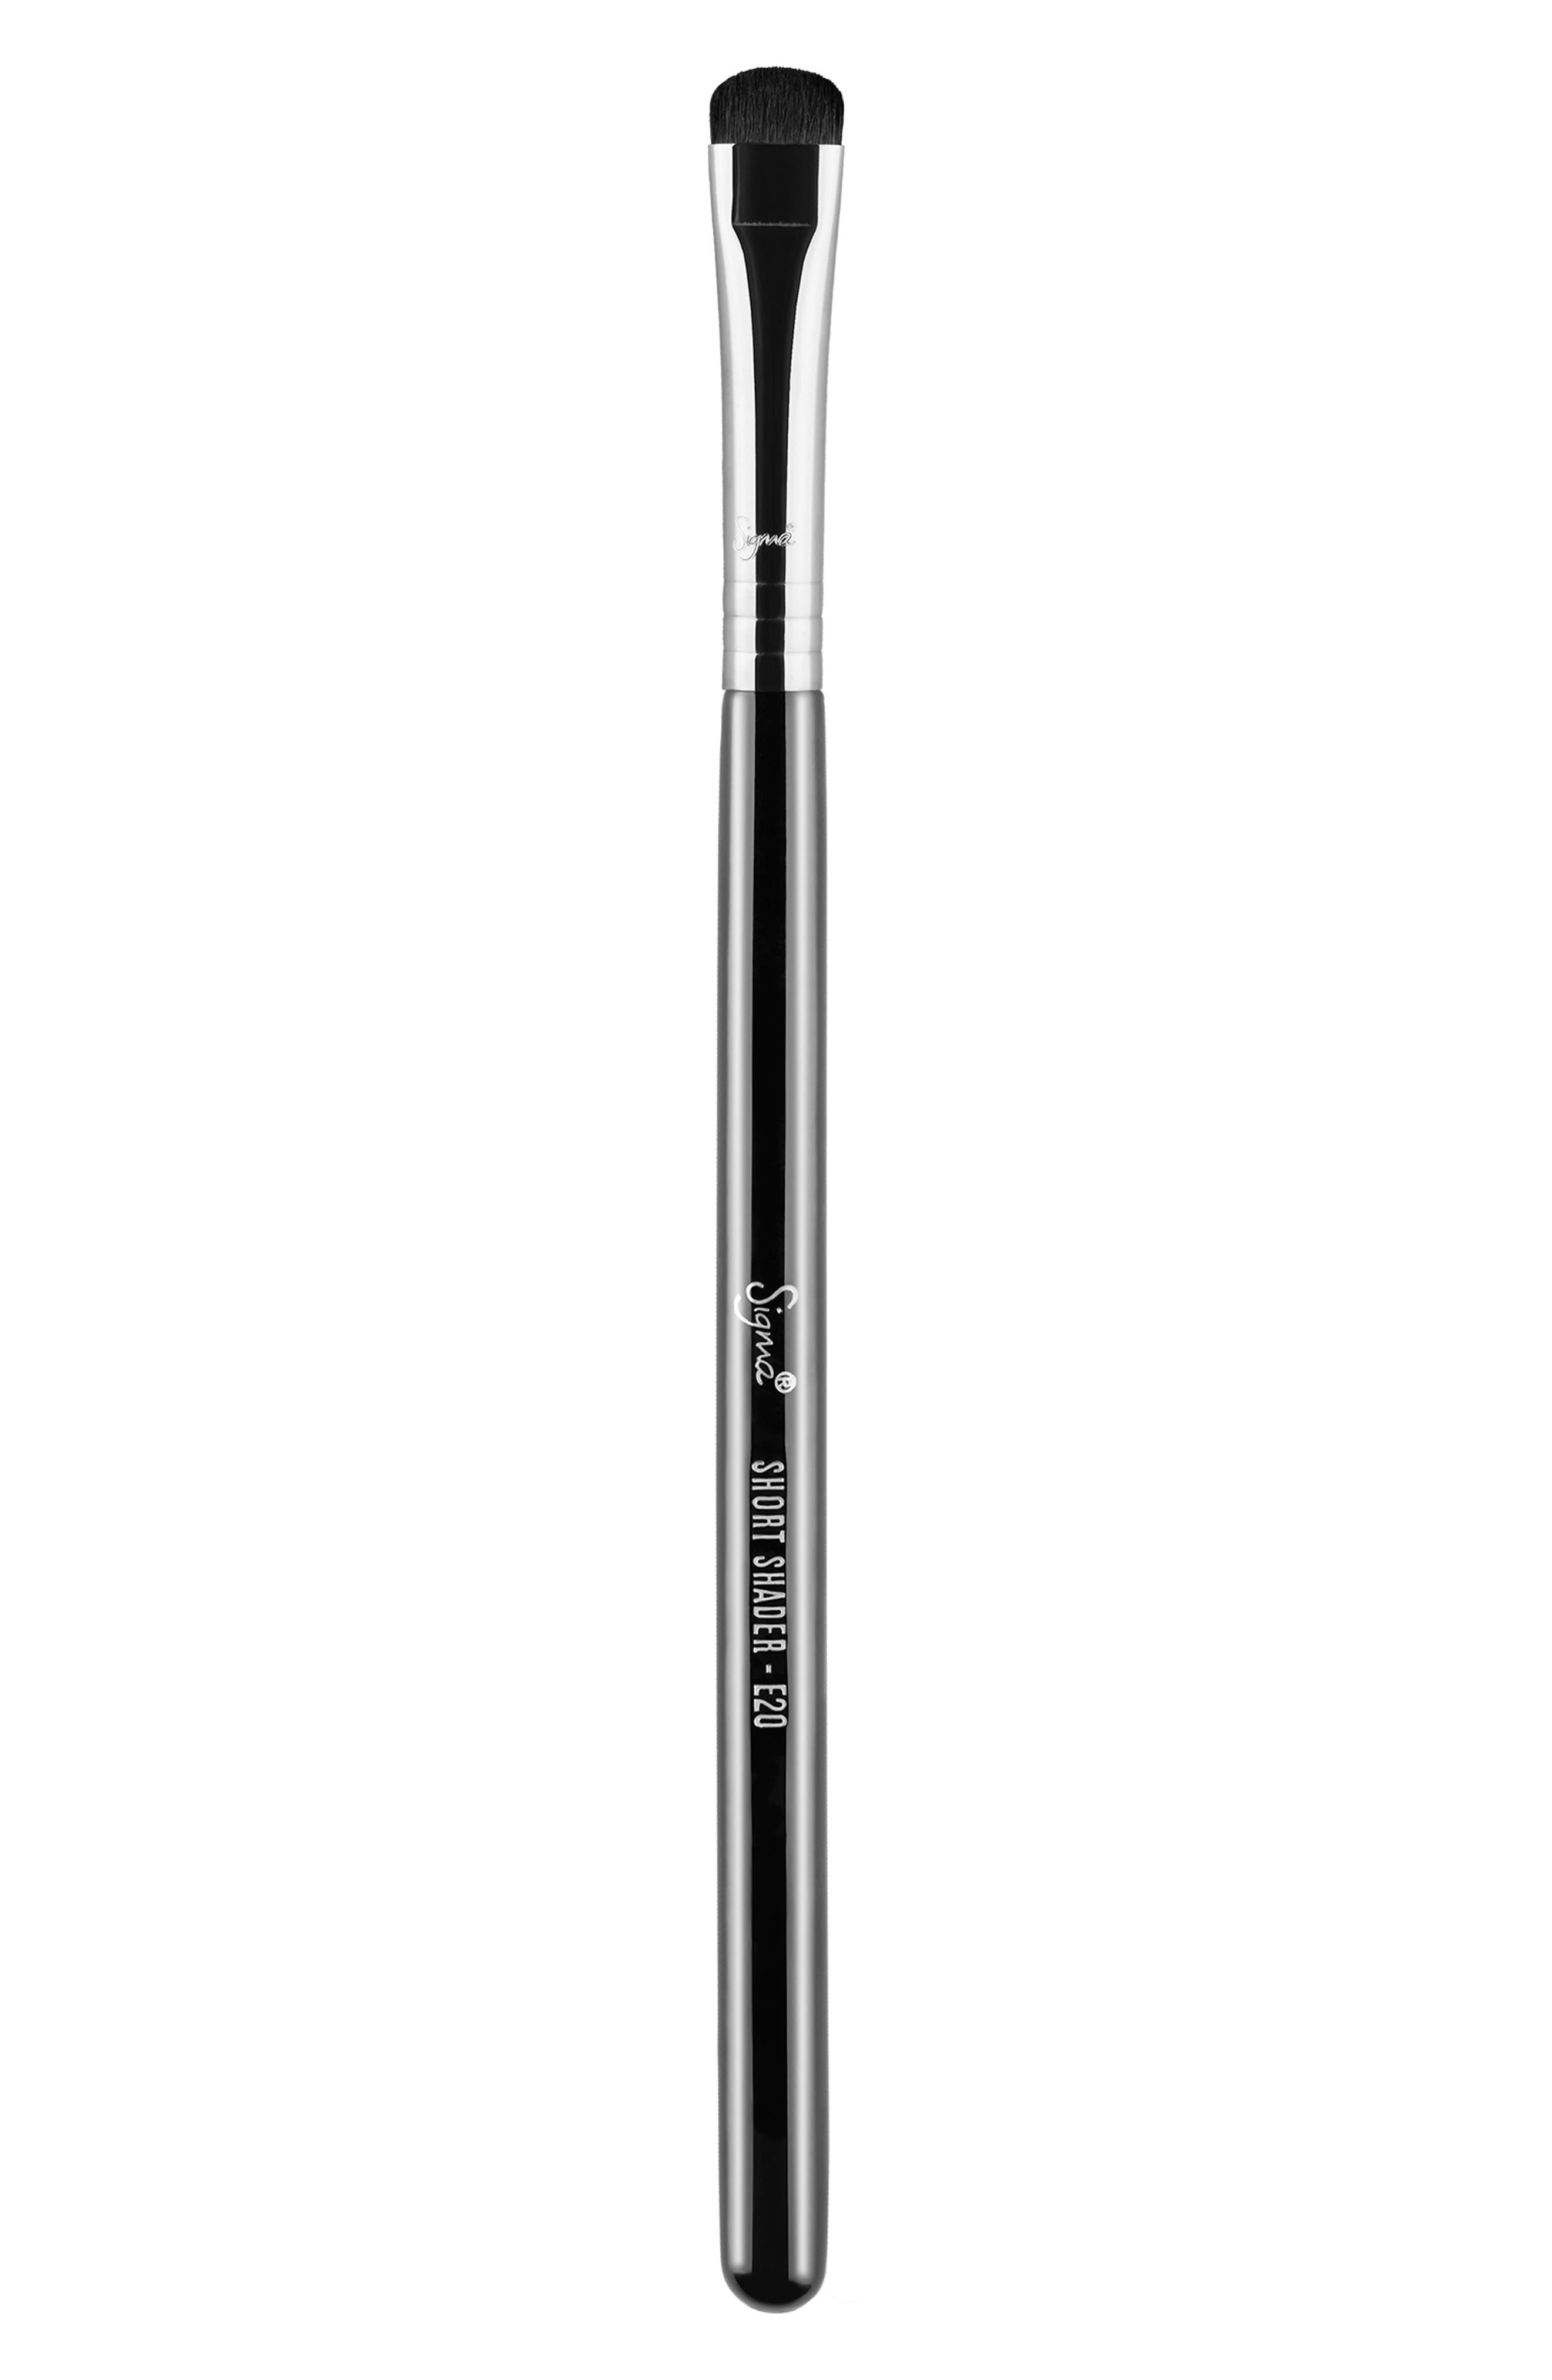 E20 Short Shader Brush,                             Alternate thumbnail 4, color,                             NO COLOR